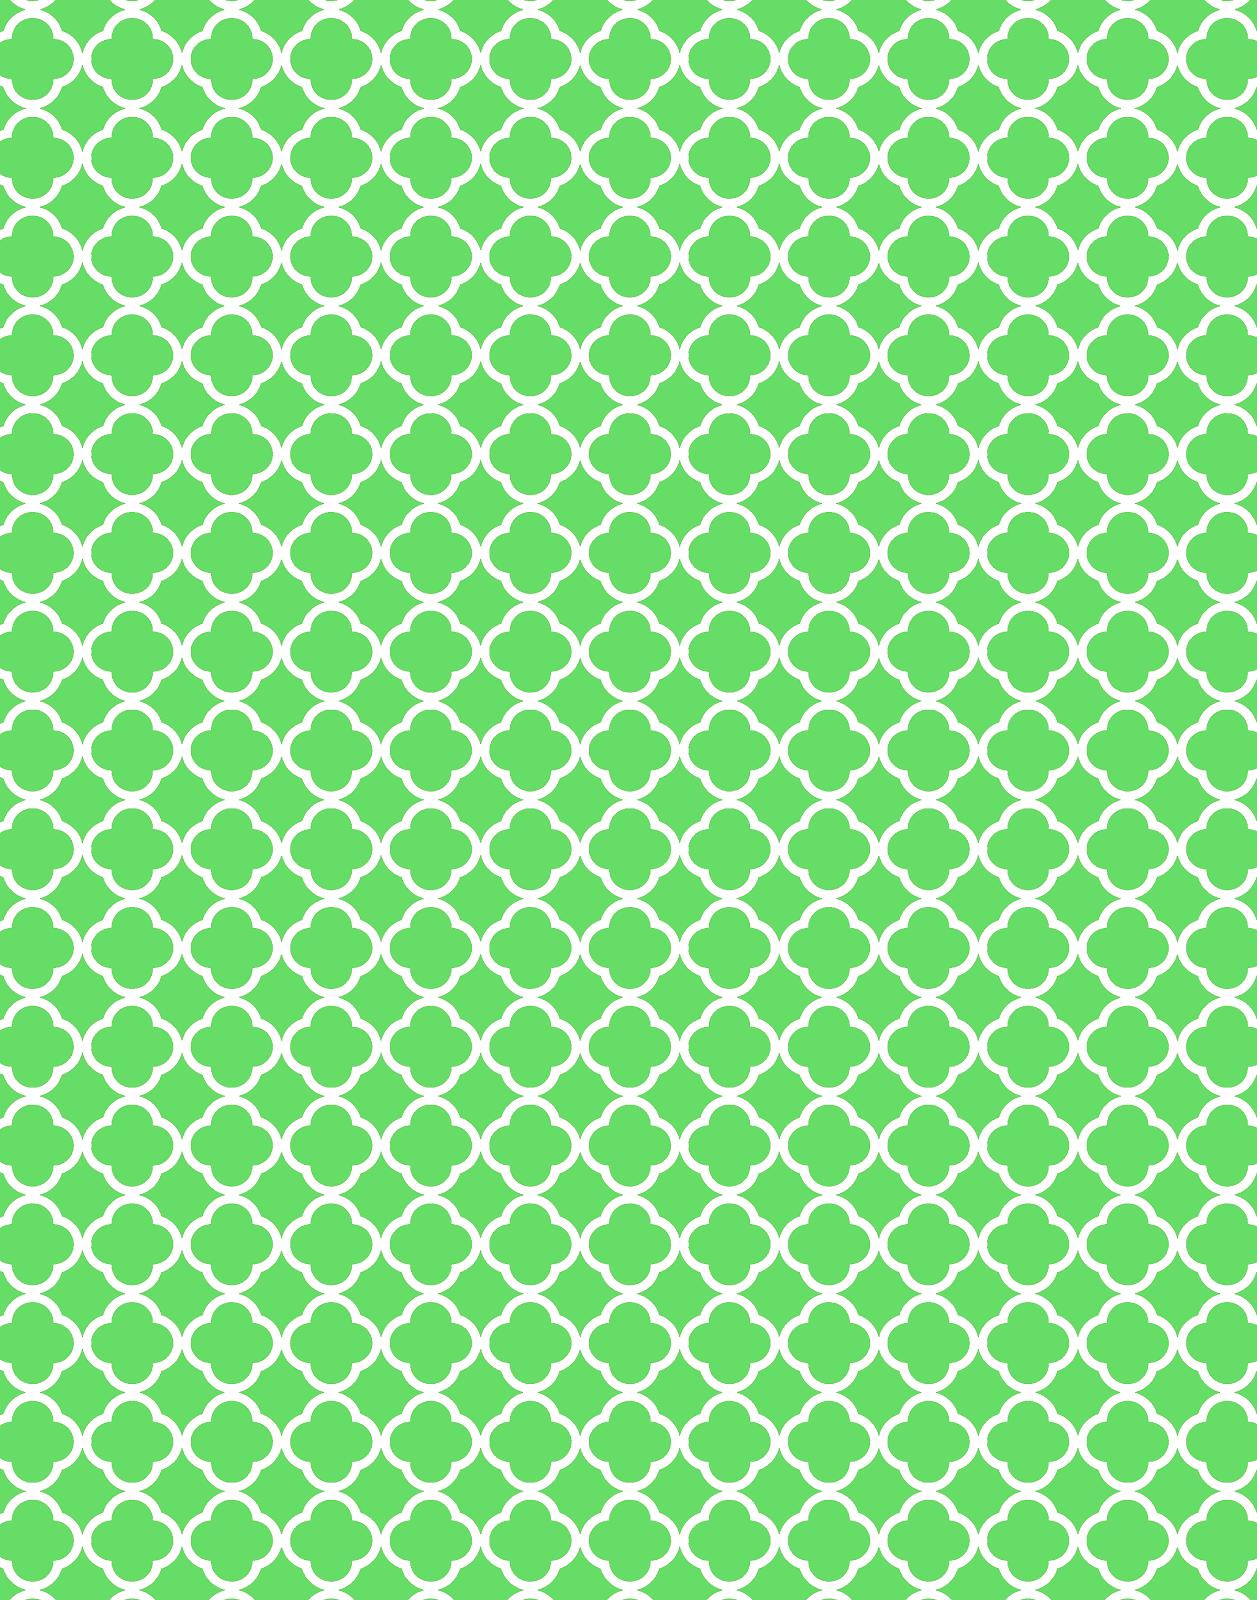 quatrefoil pattern background - photo #14